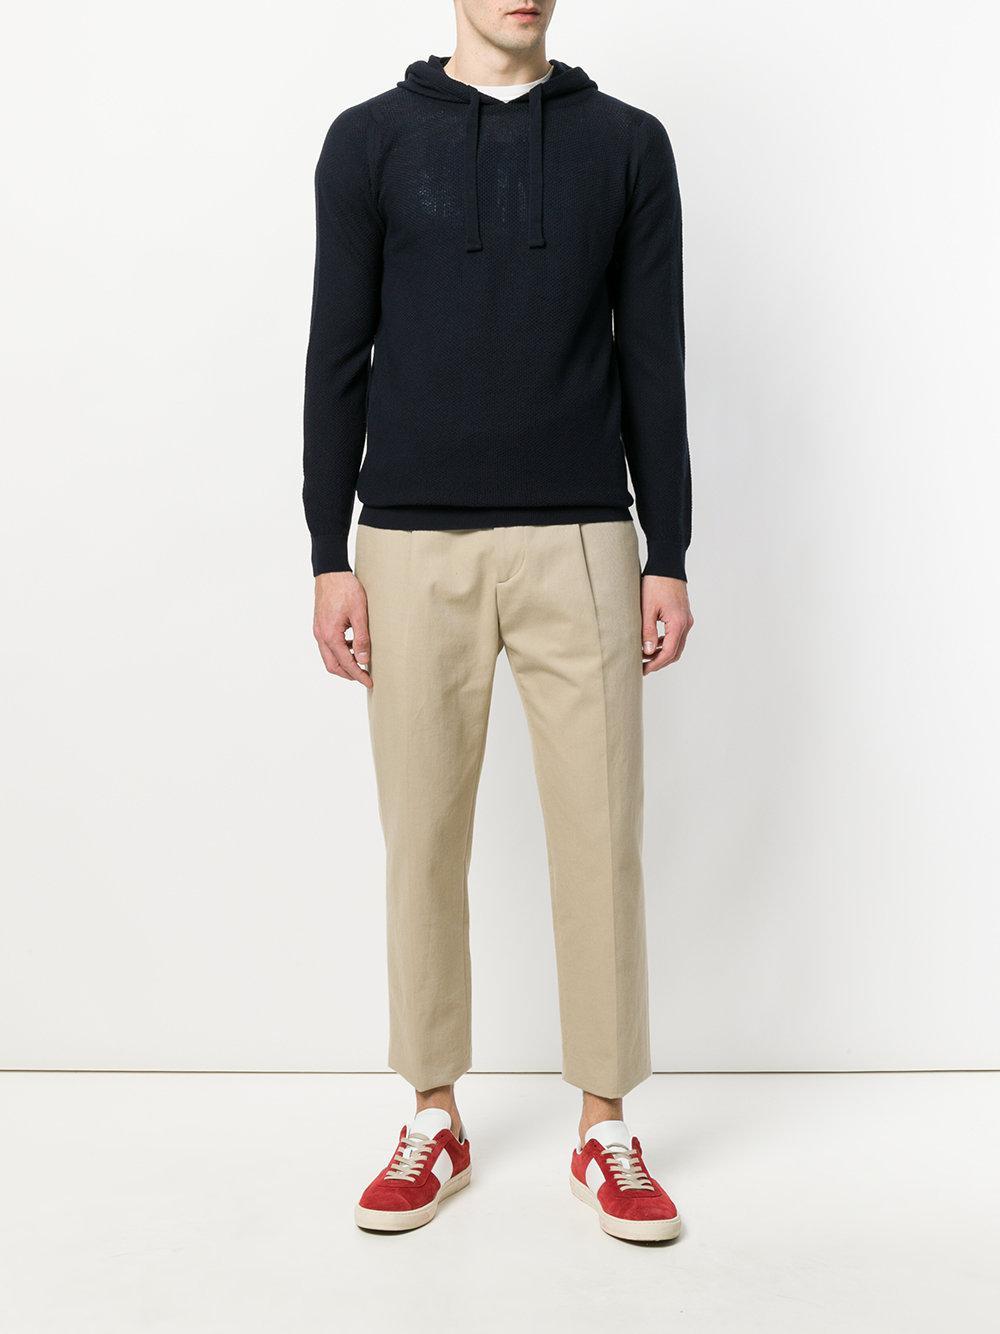 John Smedley Wool 4singular Hooded Sweater in Blue for Men